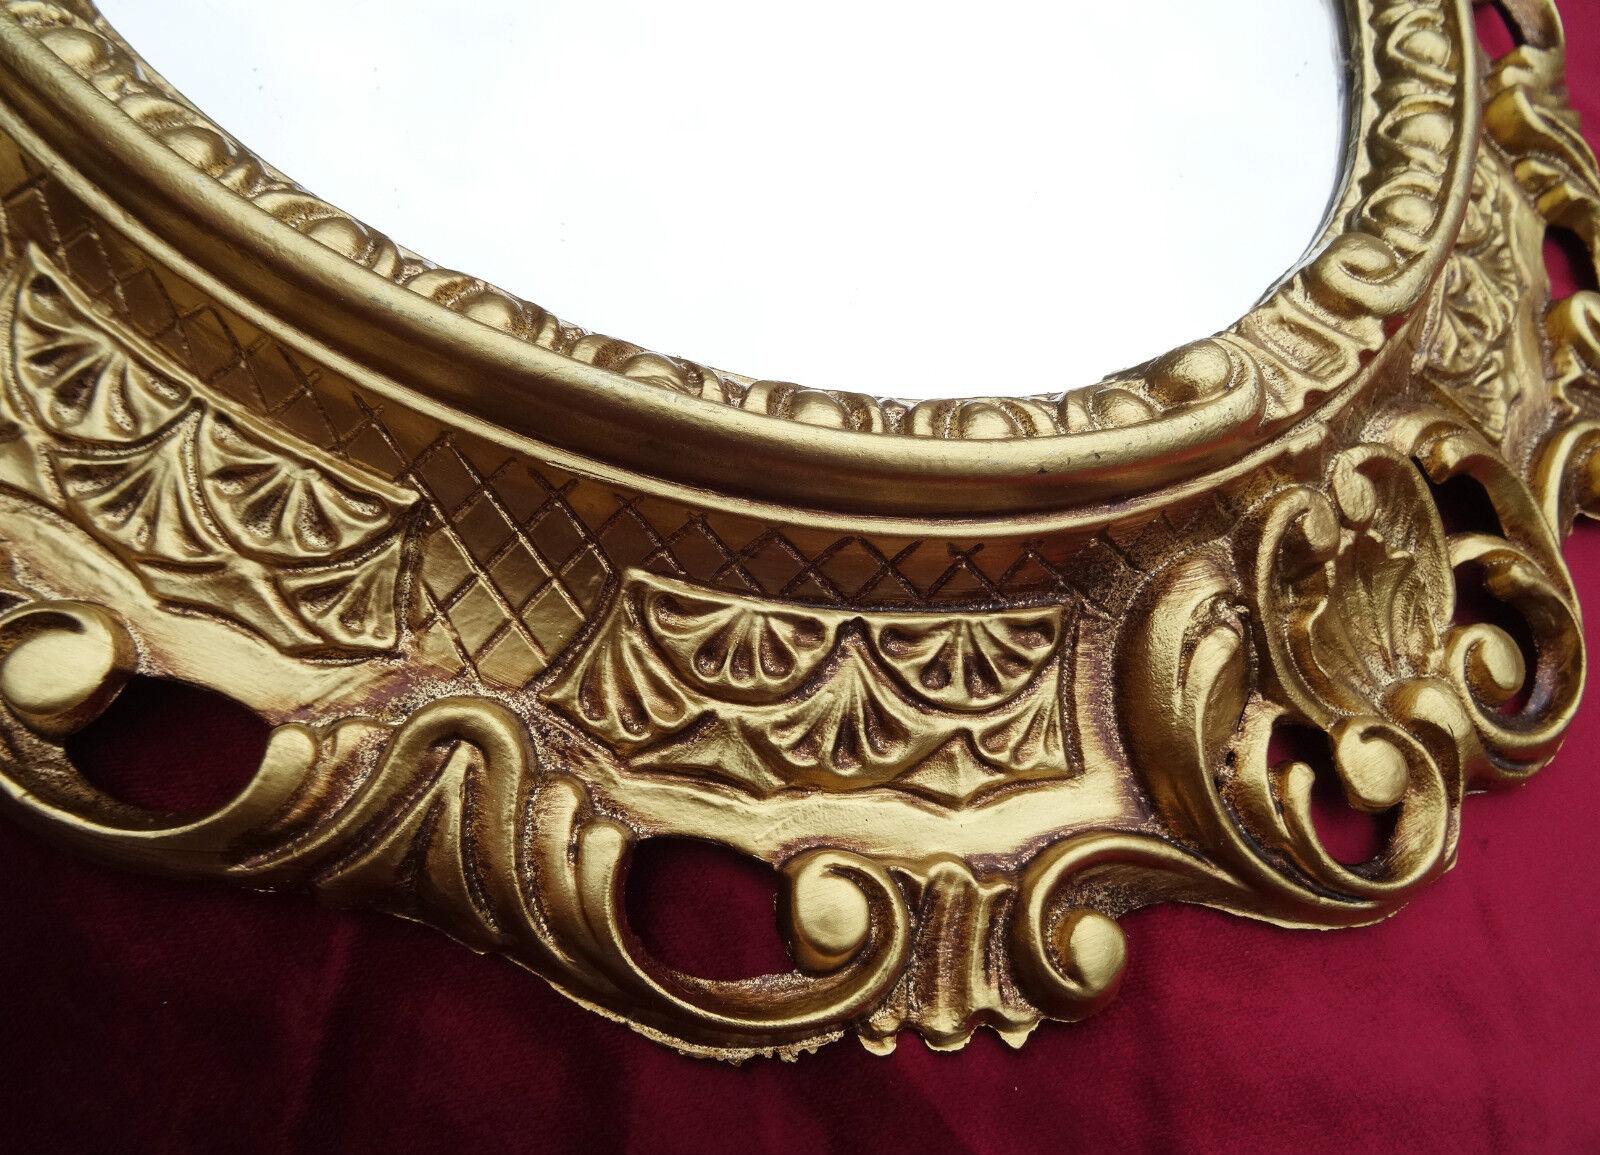 wandspiegel spiegel barock antik 345 w gold 45x38 oval badspiegel 2 ebay. Black Bedroom Furniture Sets. Home Design Ideas